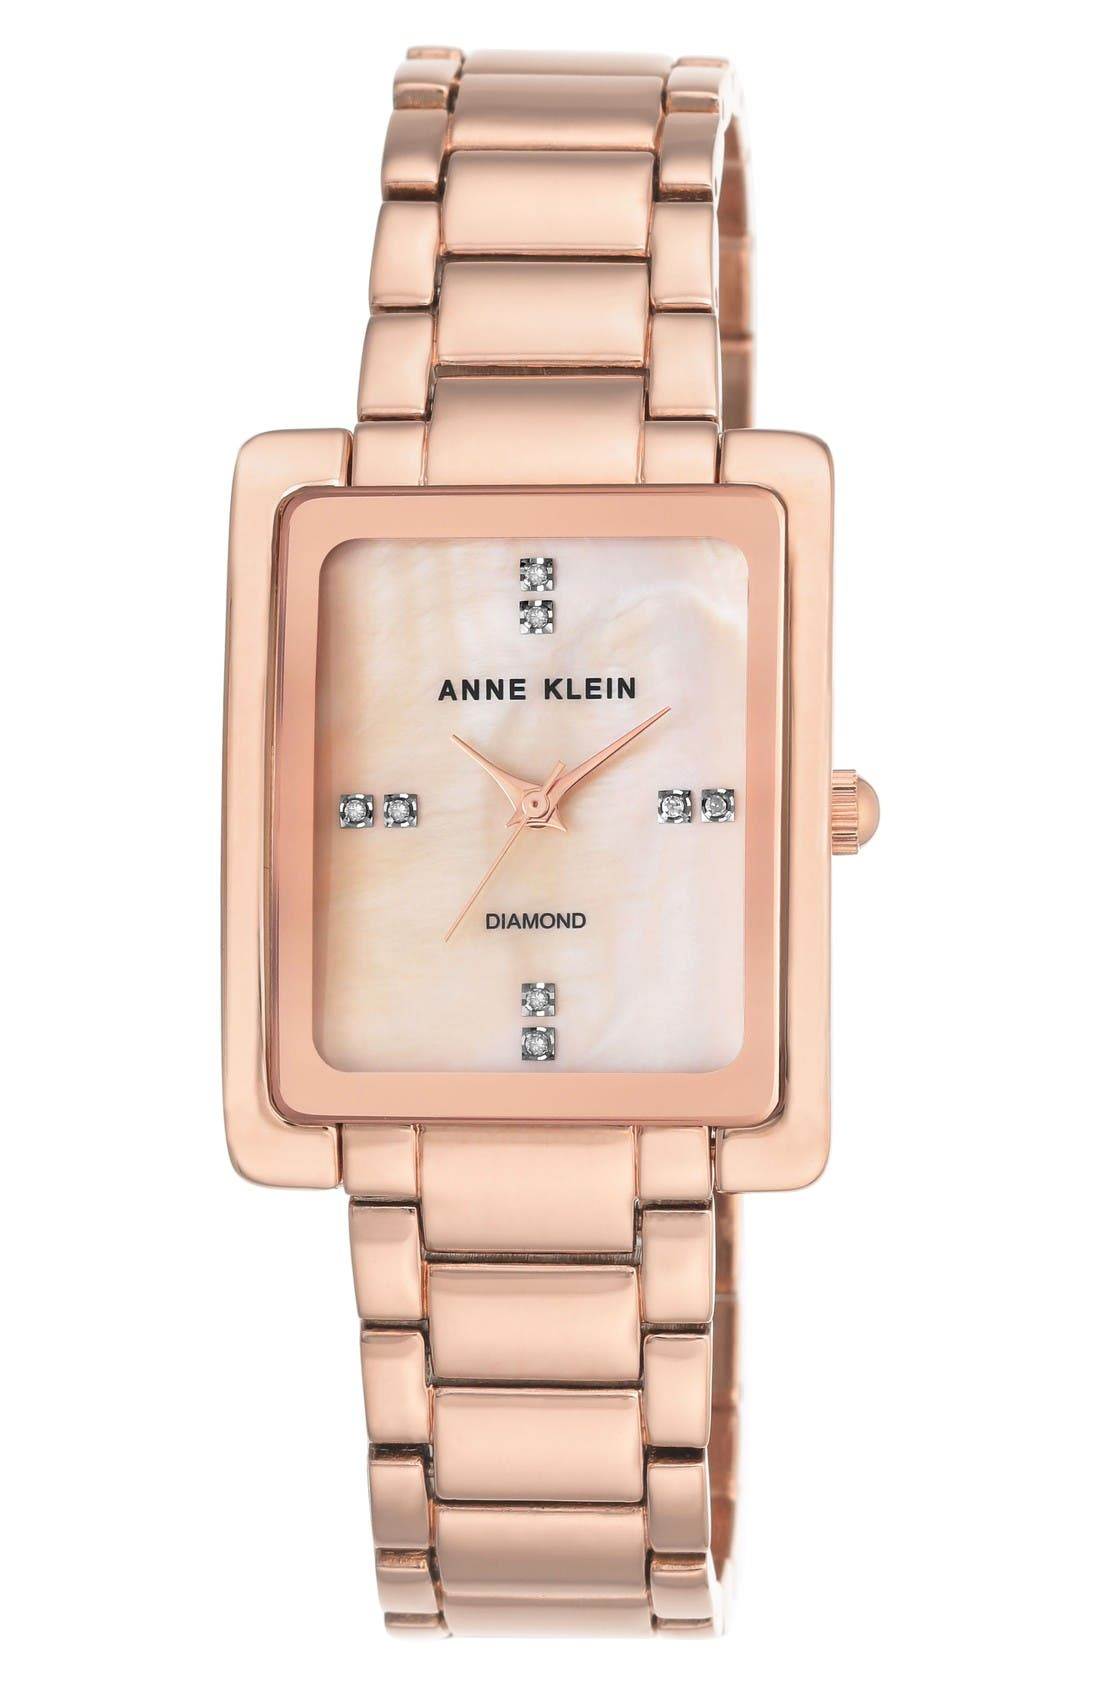 Main Image - Anne Klein Diamond Bracelet Watch, 28mm x 35mm